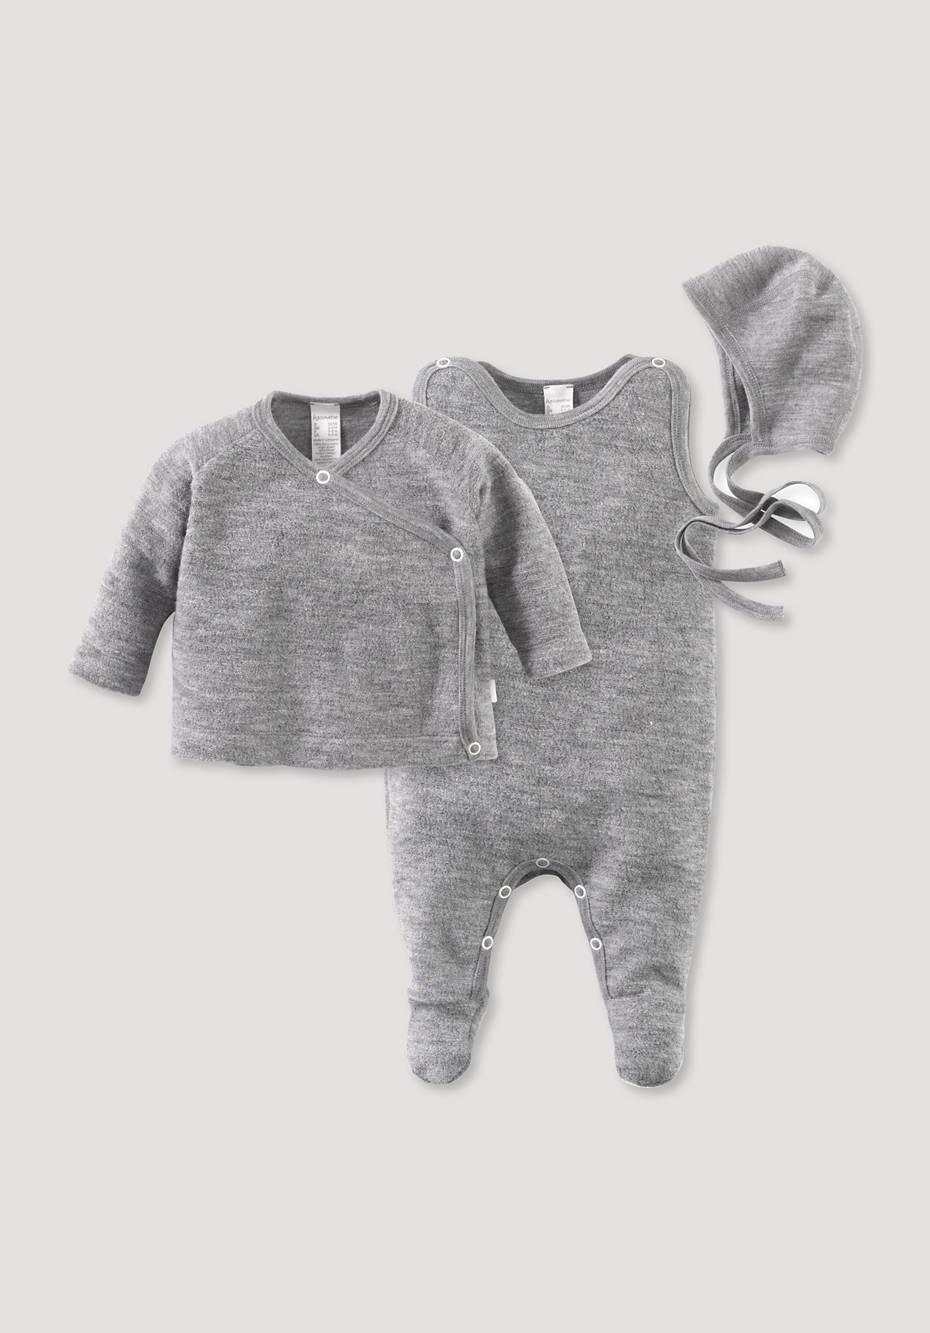 Baby ERSTLINGSPAKET WOLLFROTTEE AUS REINER BIO-MERINOWOLLE grau